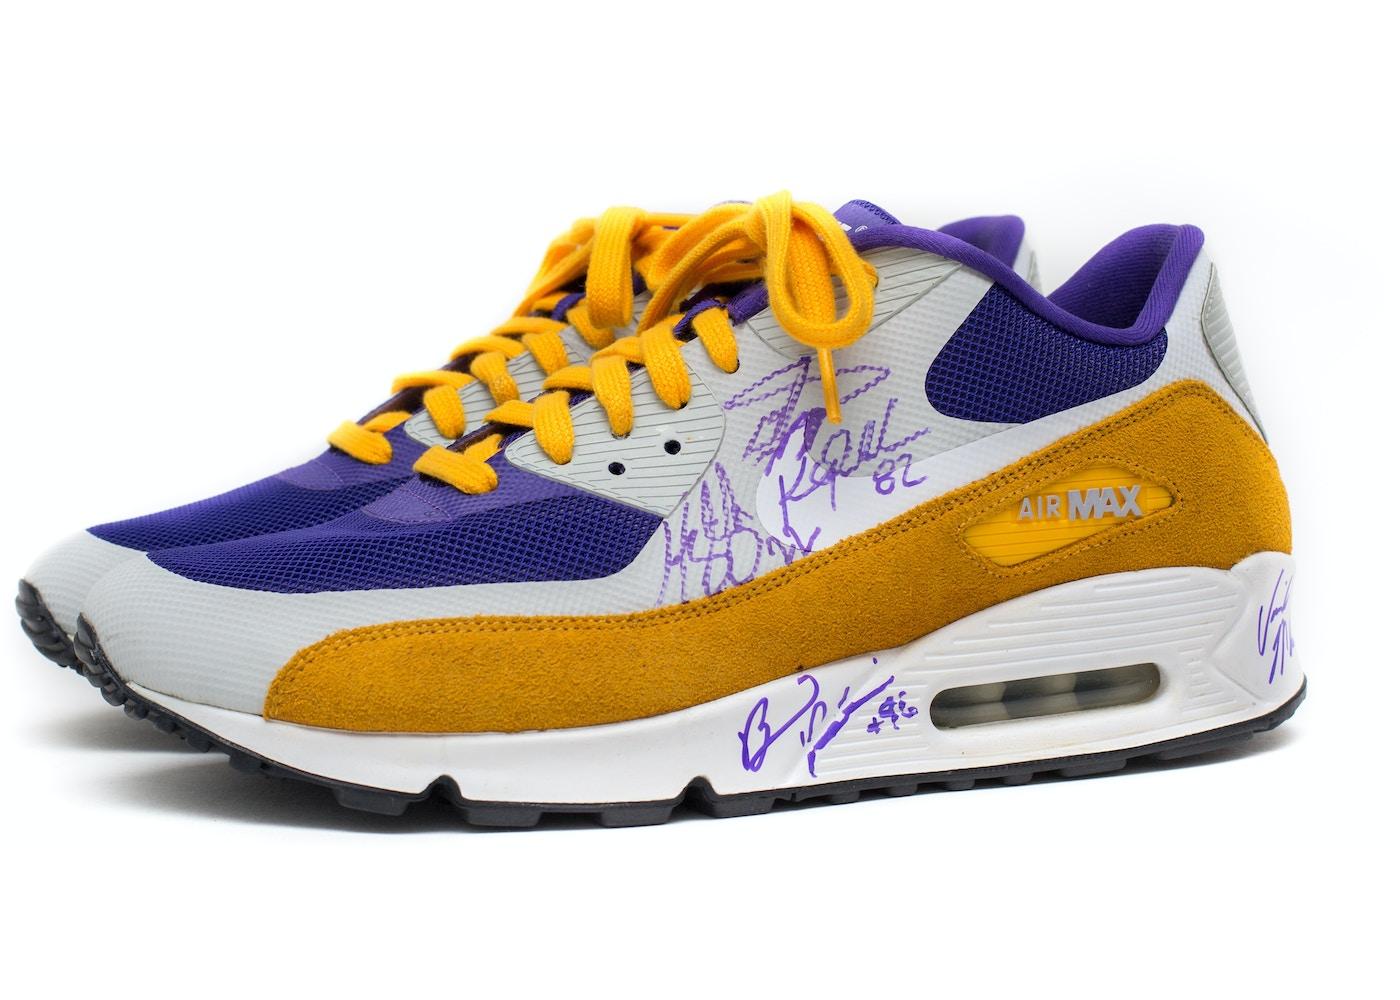 official photos 1e79c d5d9a Nike Air Max 90 Minnesota Vikings Signed (sz 12)